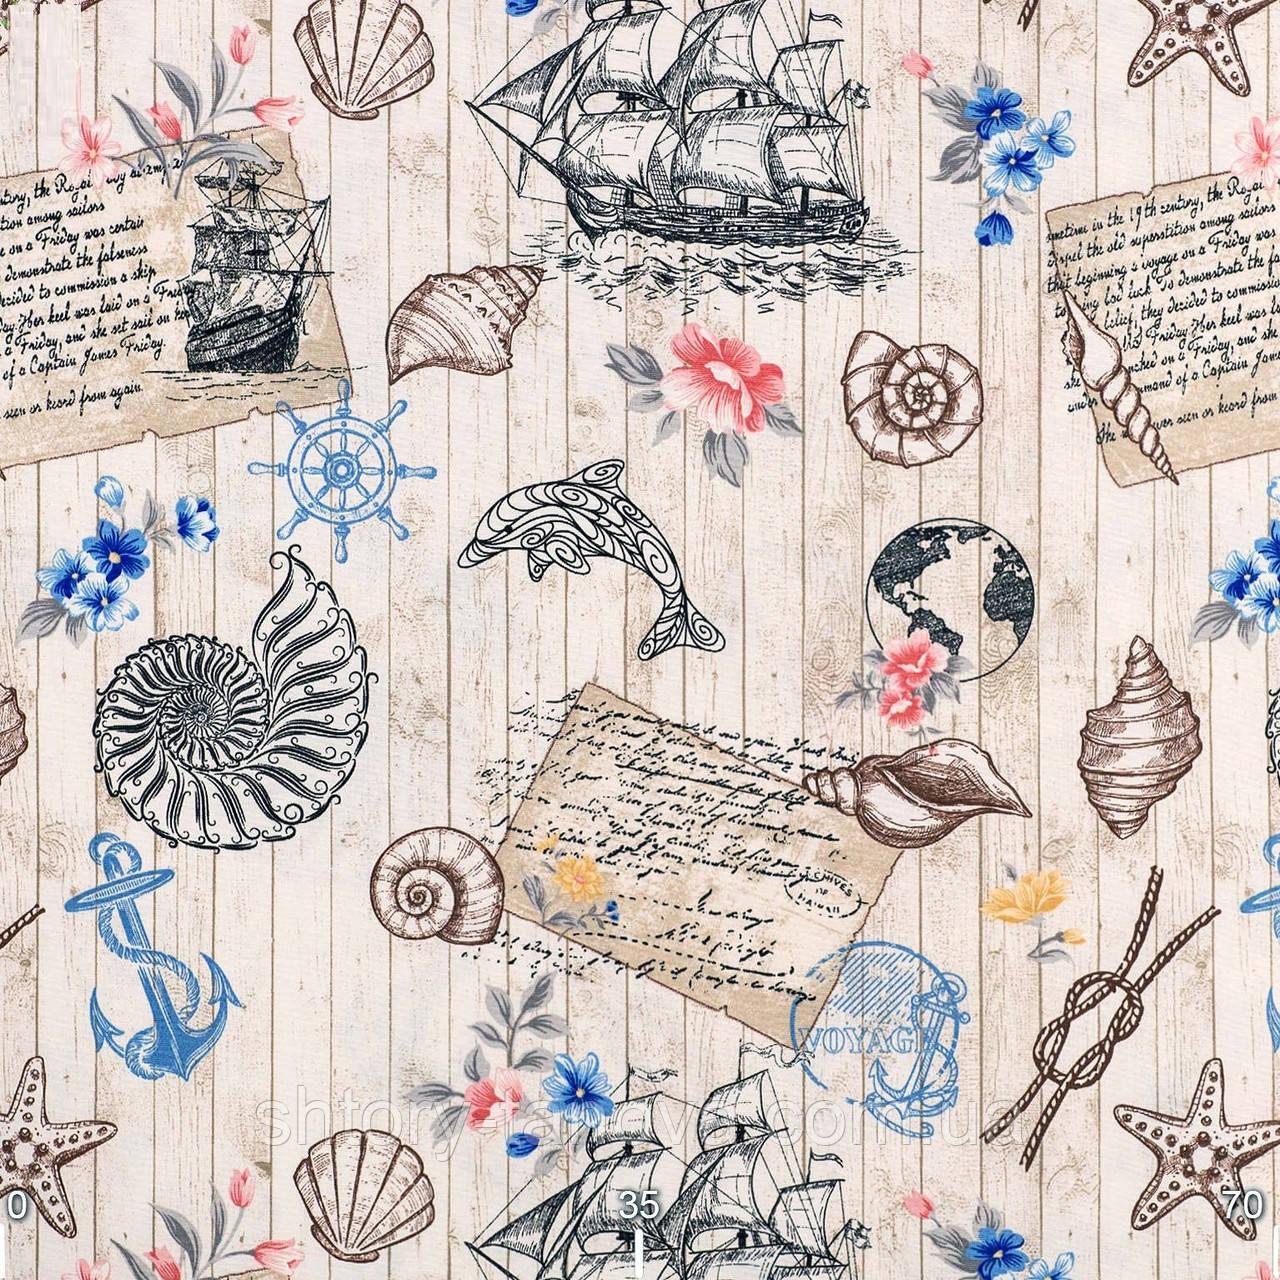 Ткань для штор в морская тематика тефлон скидка